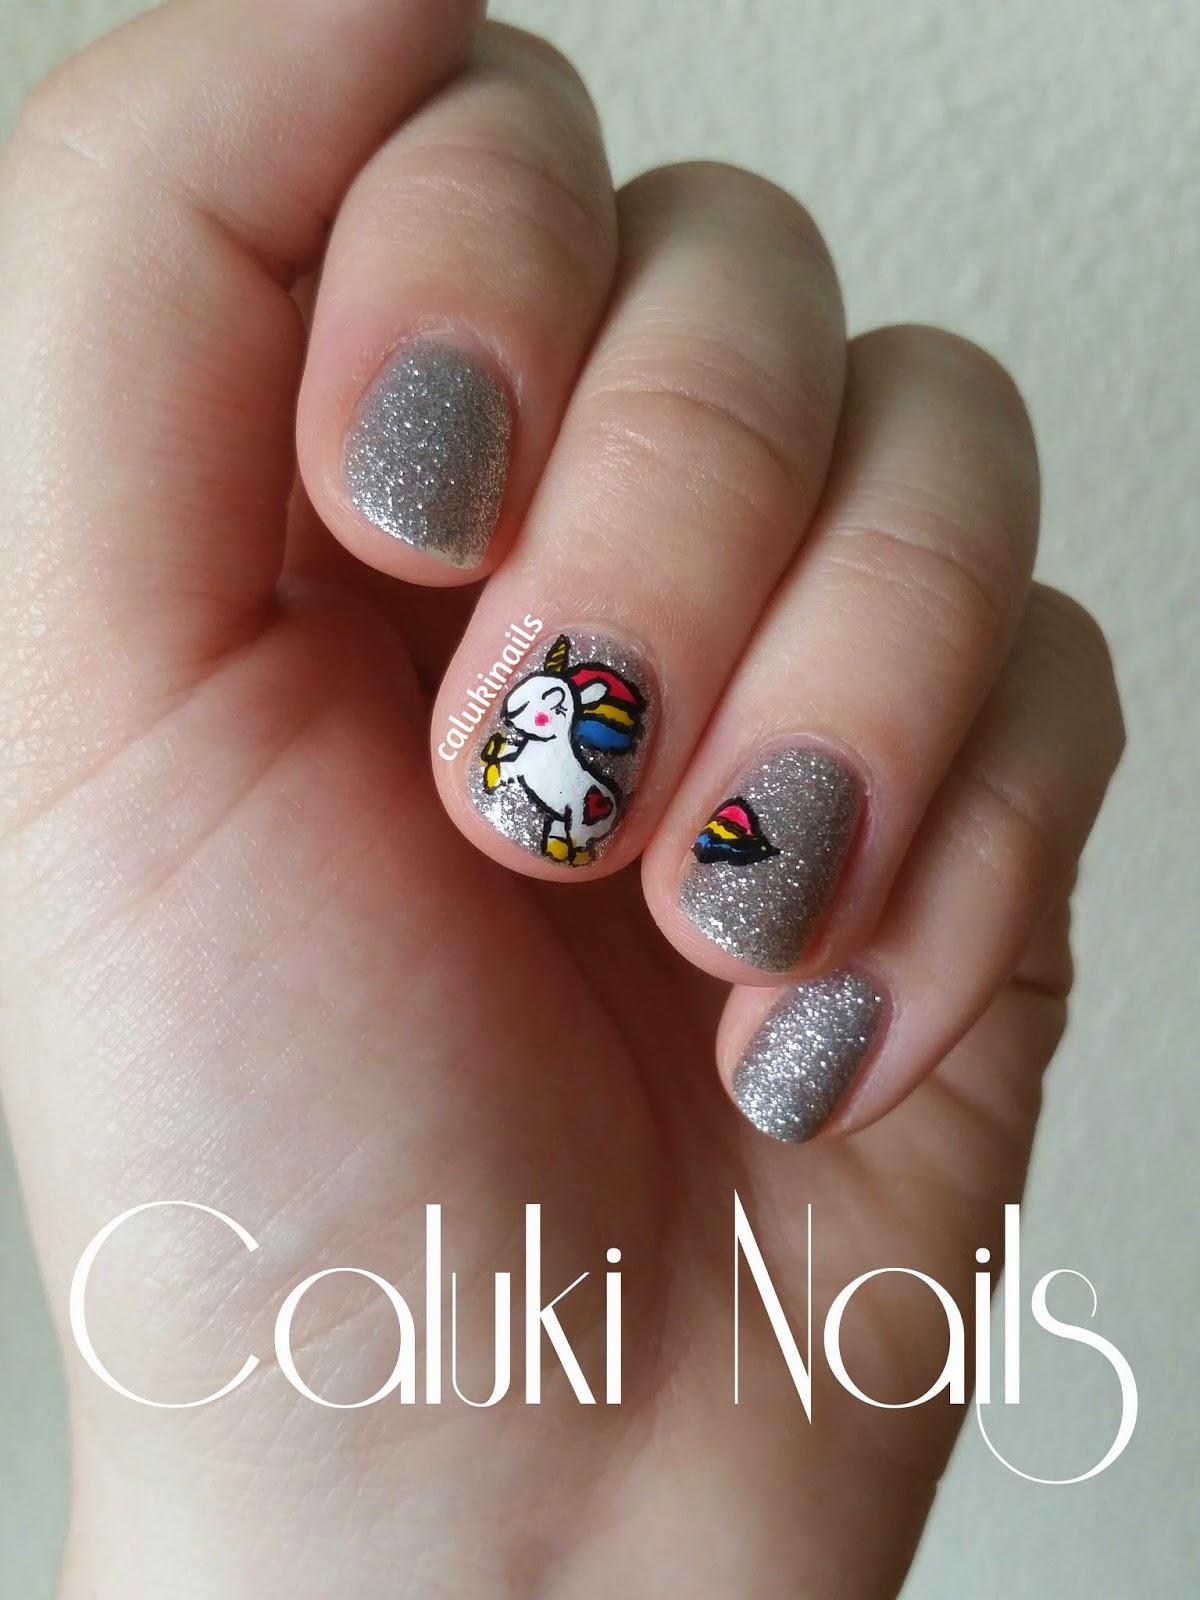 Caluki Nails Nail Art Unicornio Magnífica Masglo